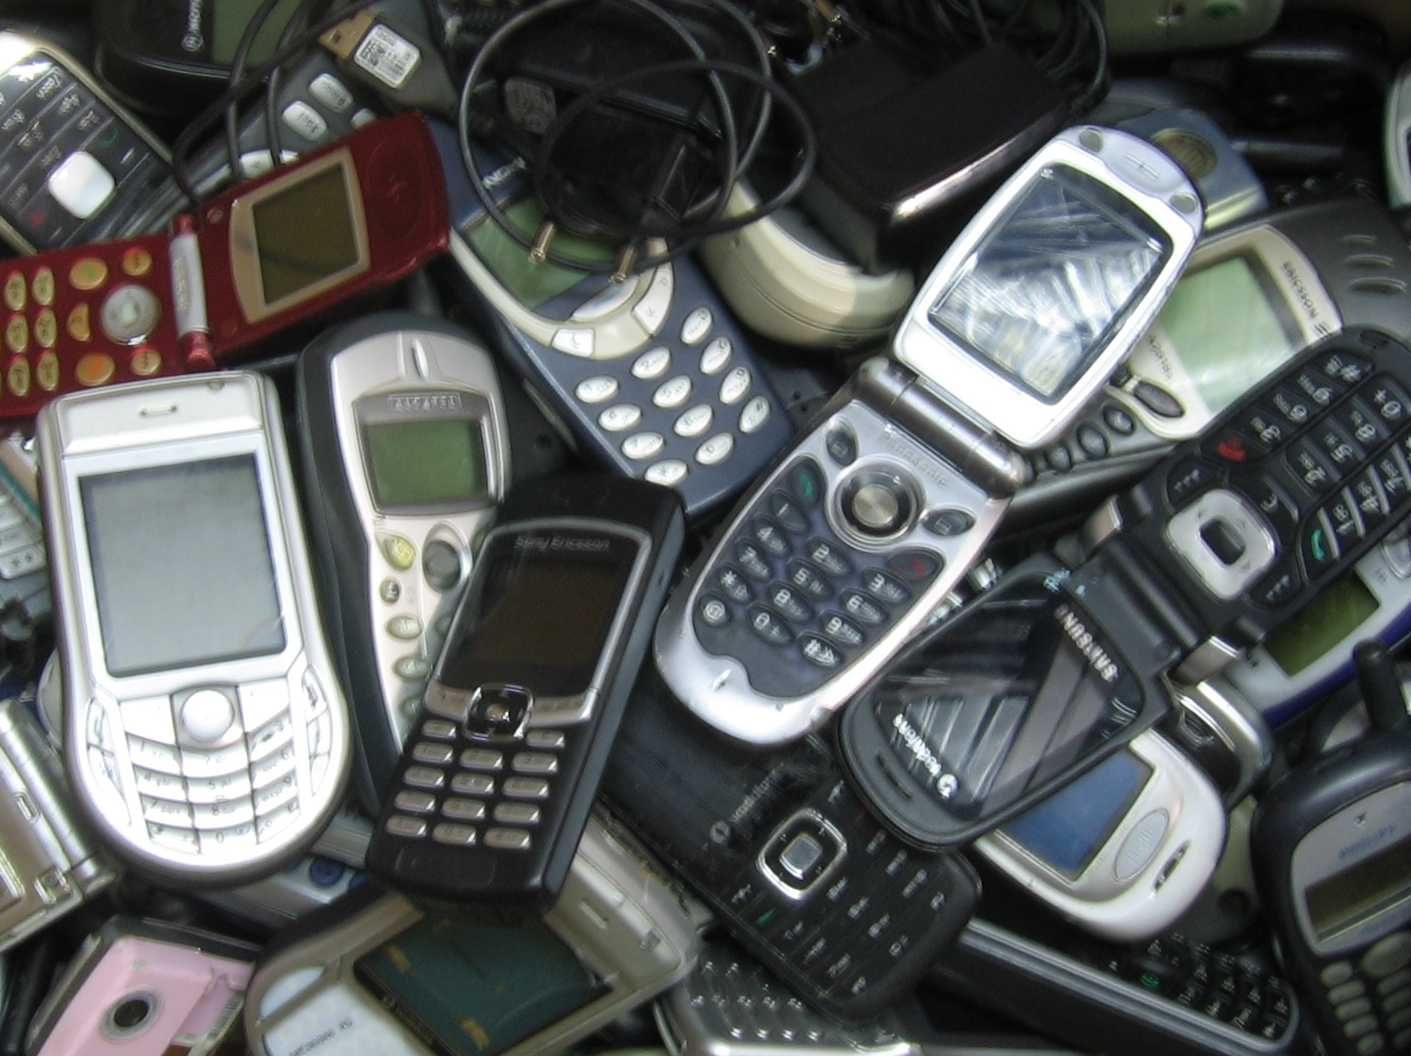 KUPIĘ stare telefony złom telefon Opole